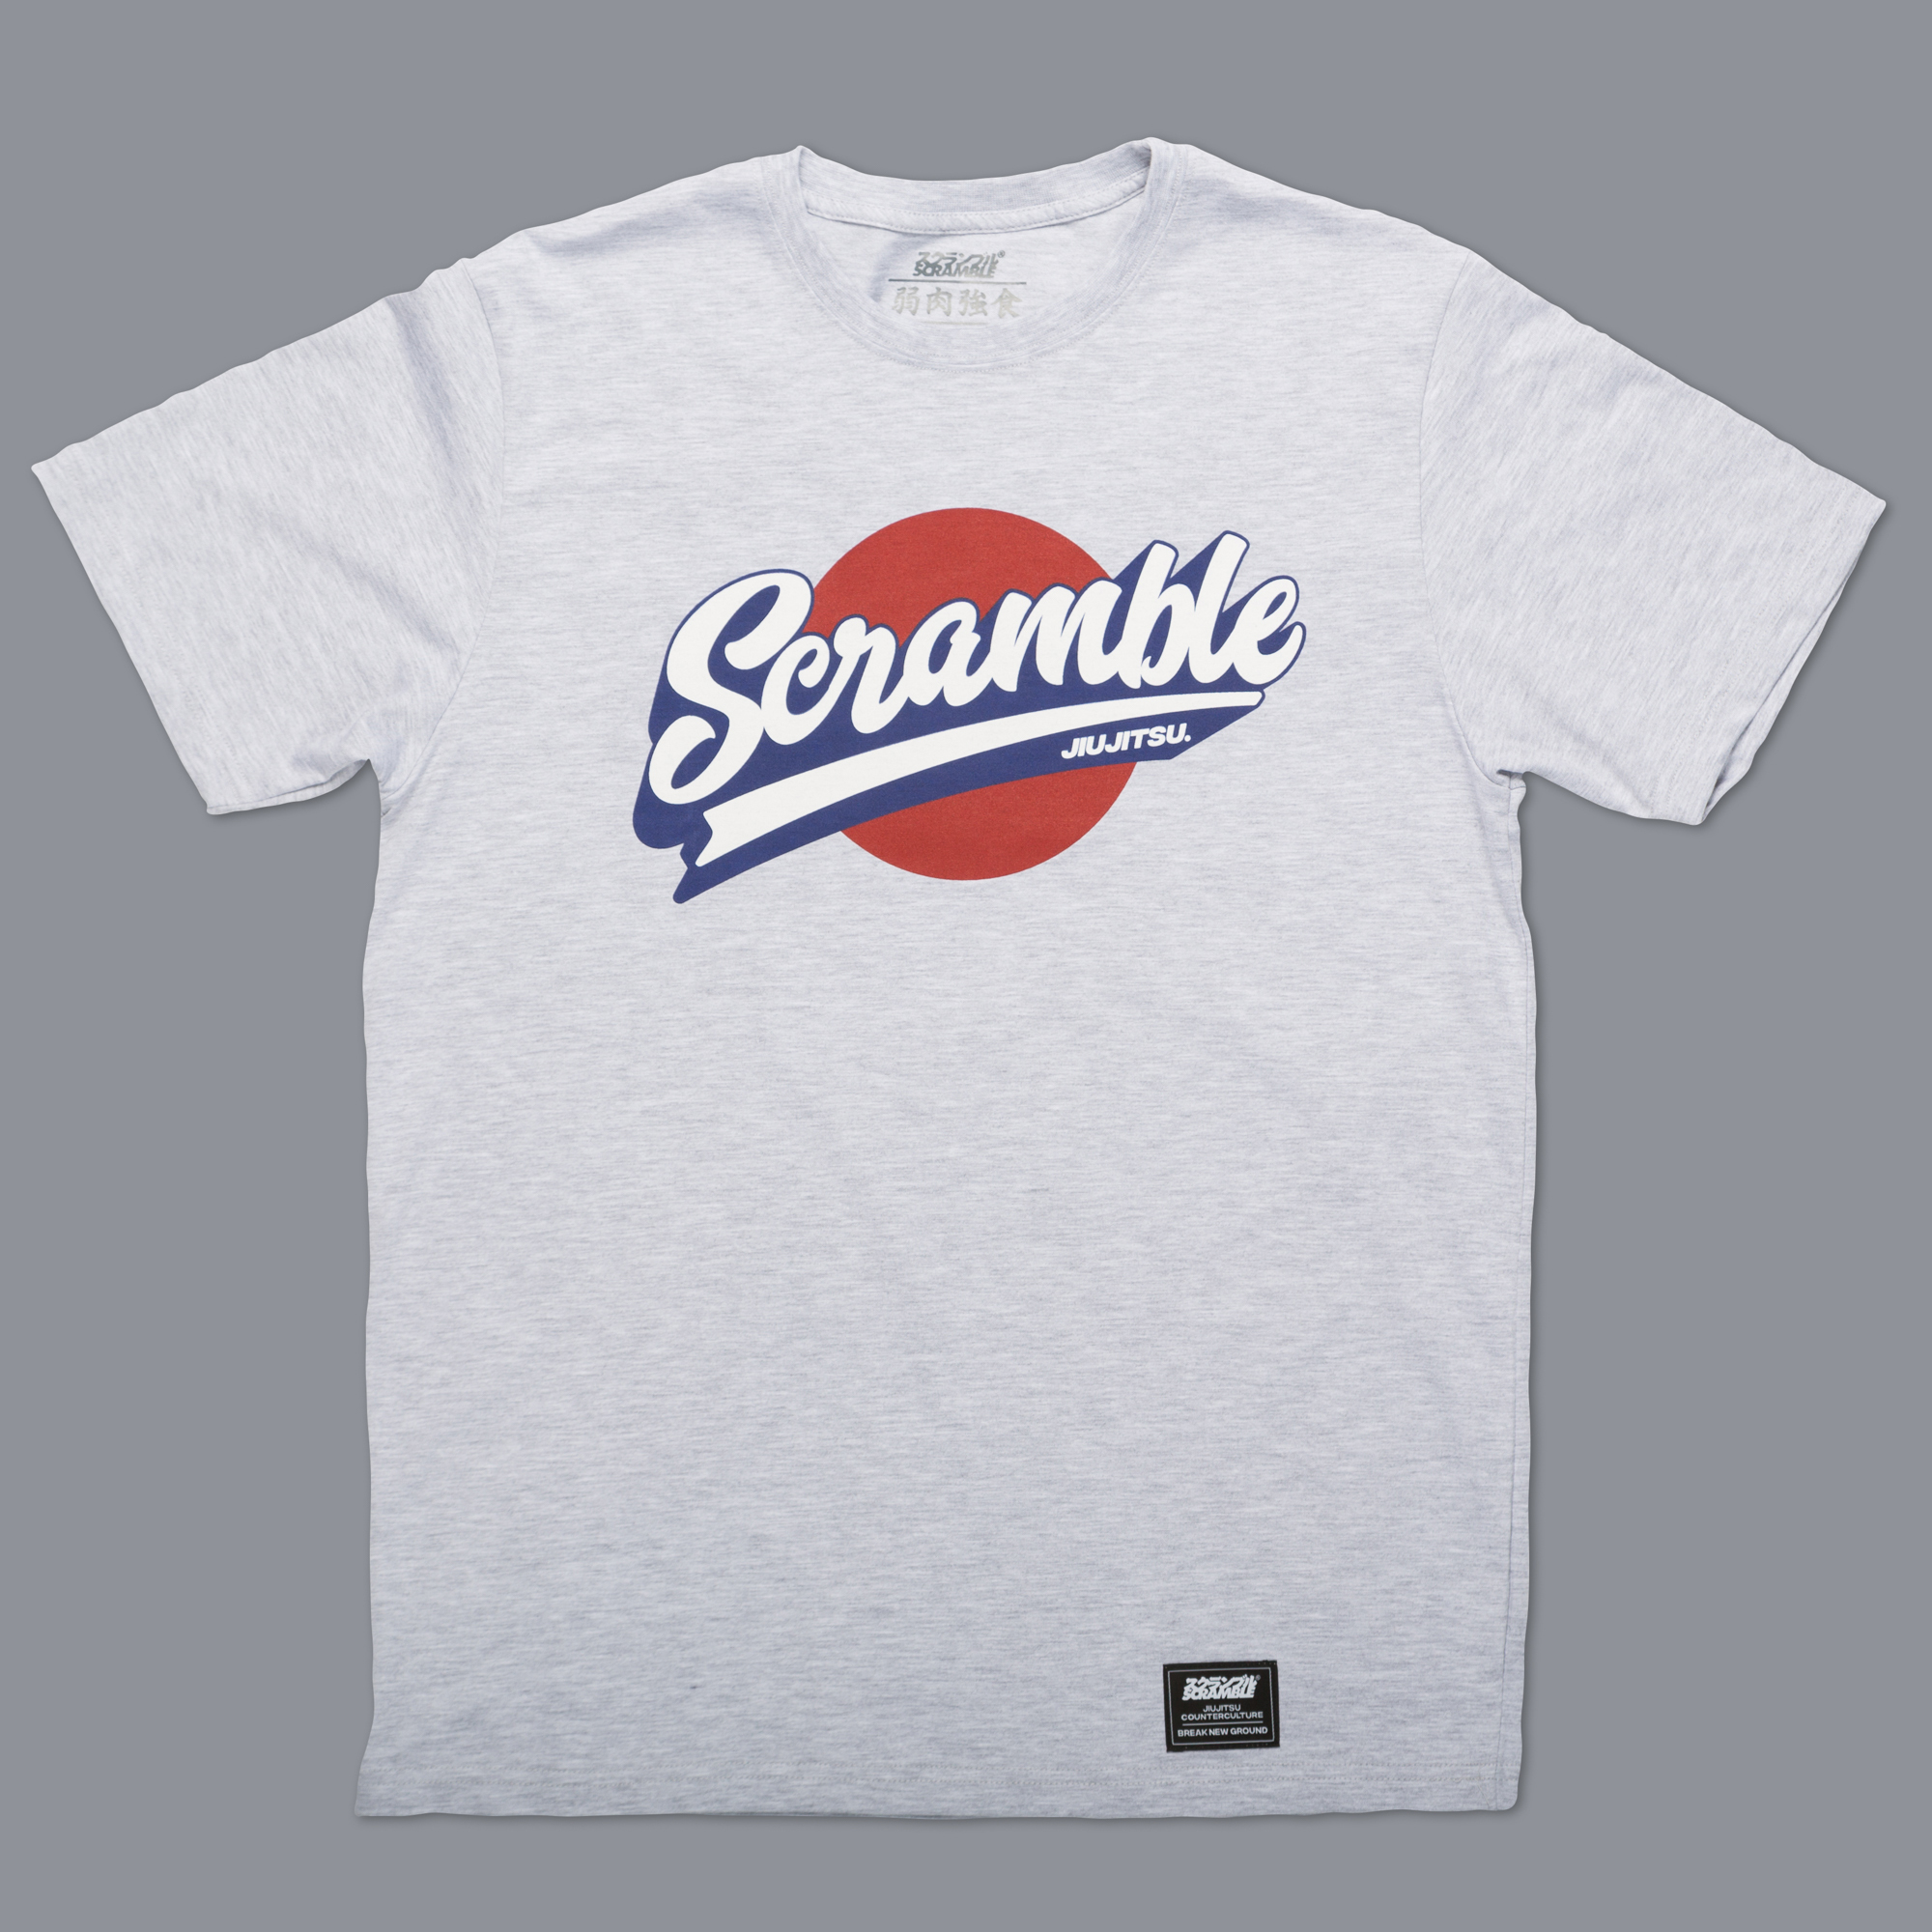 Scramble Sport Logo Tee - Grey|格闘技、柔術Tシャツ